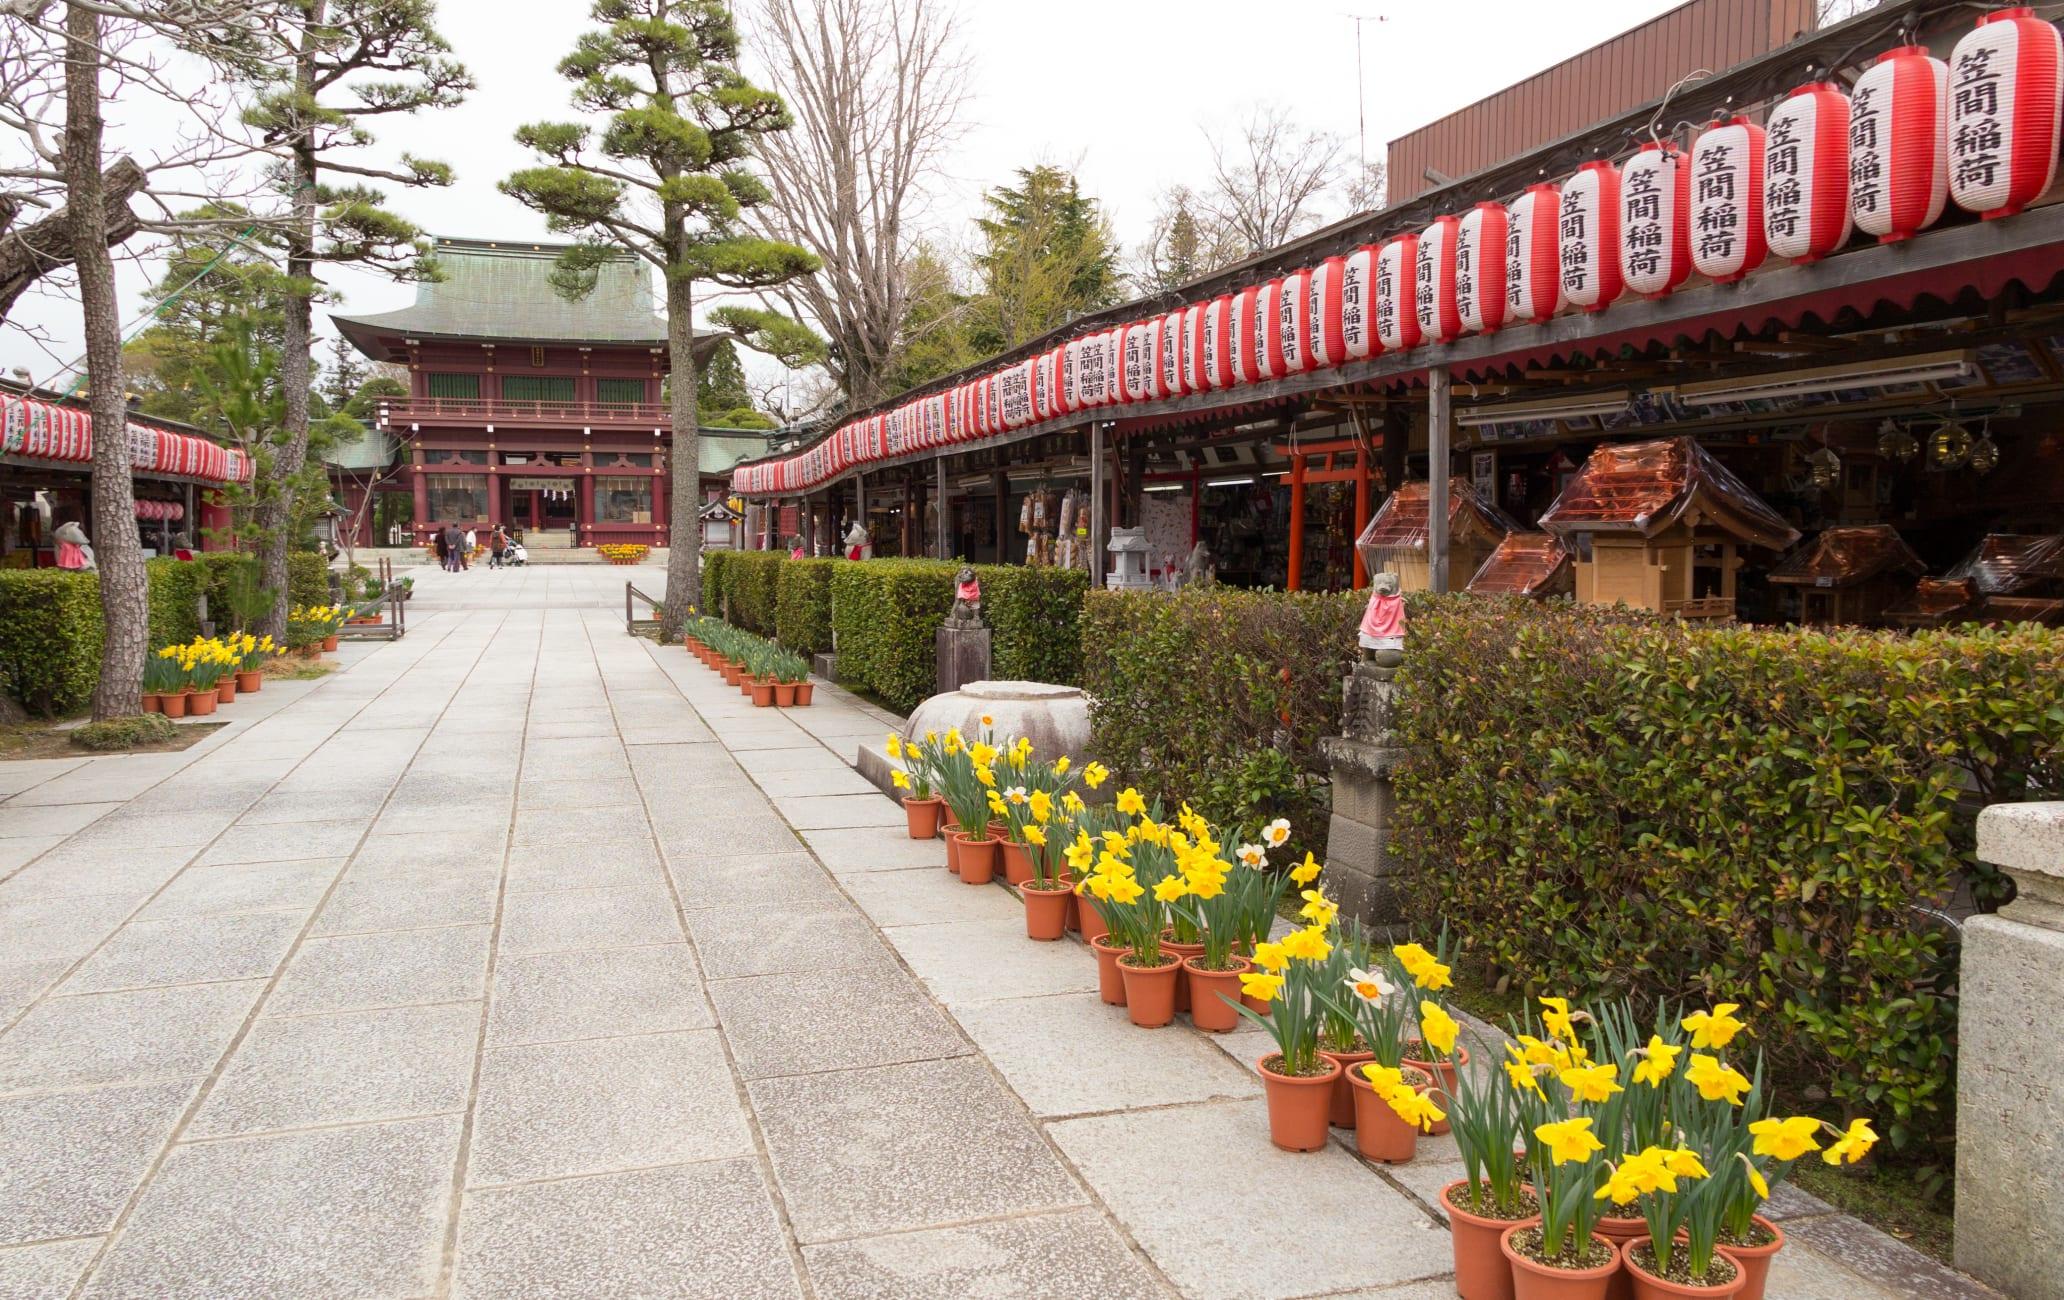 Kasama Inari-jinja Shrine